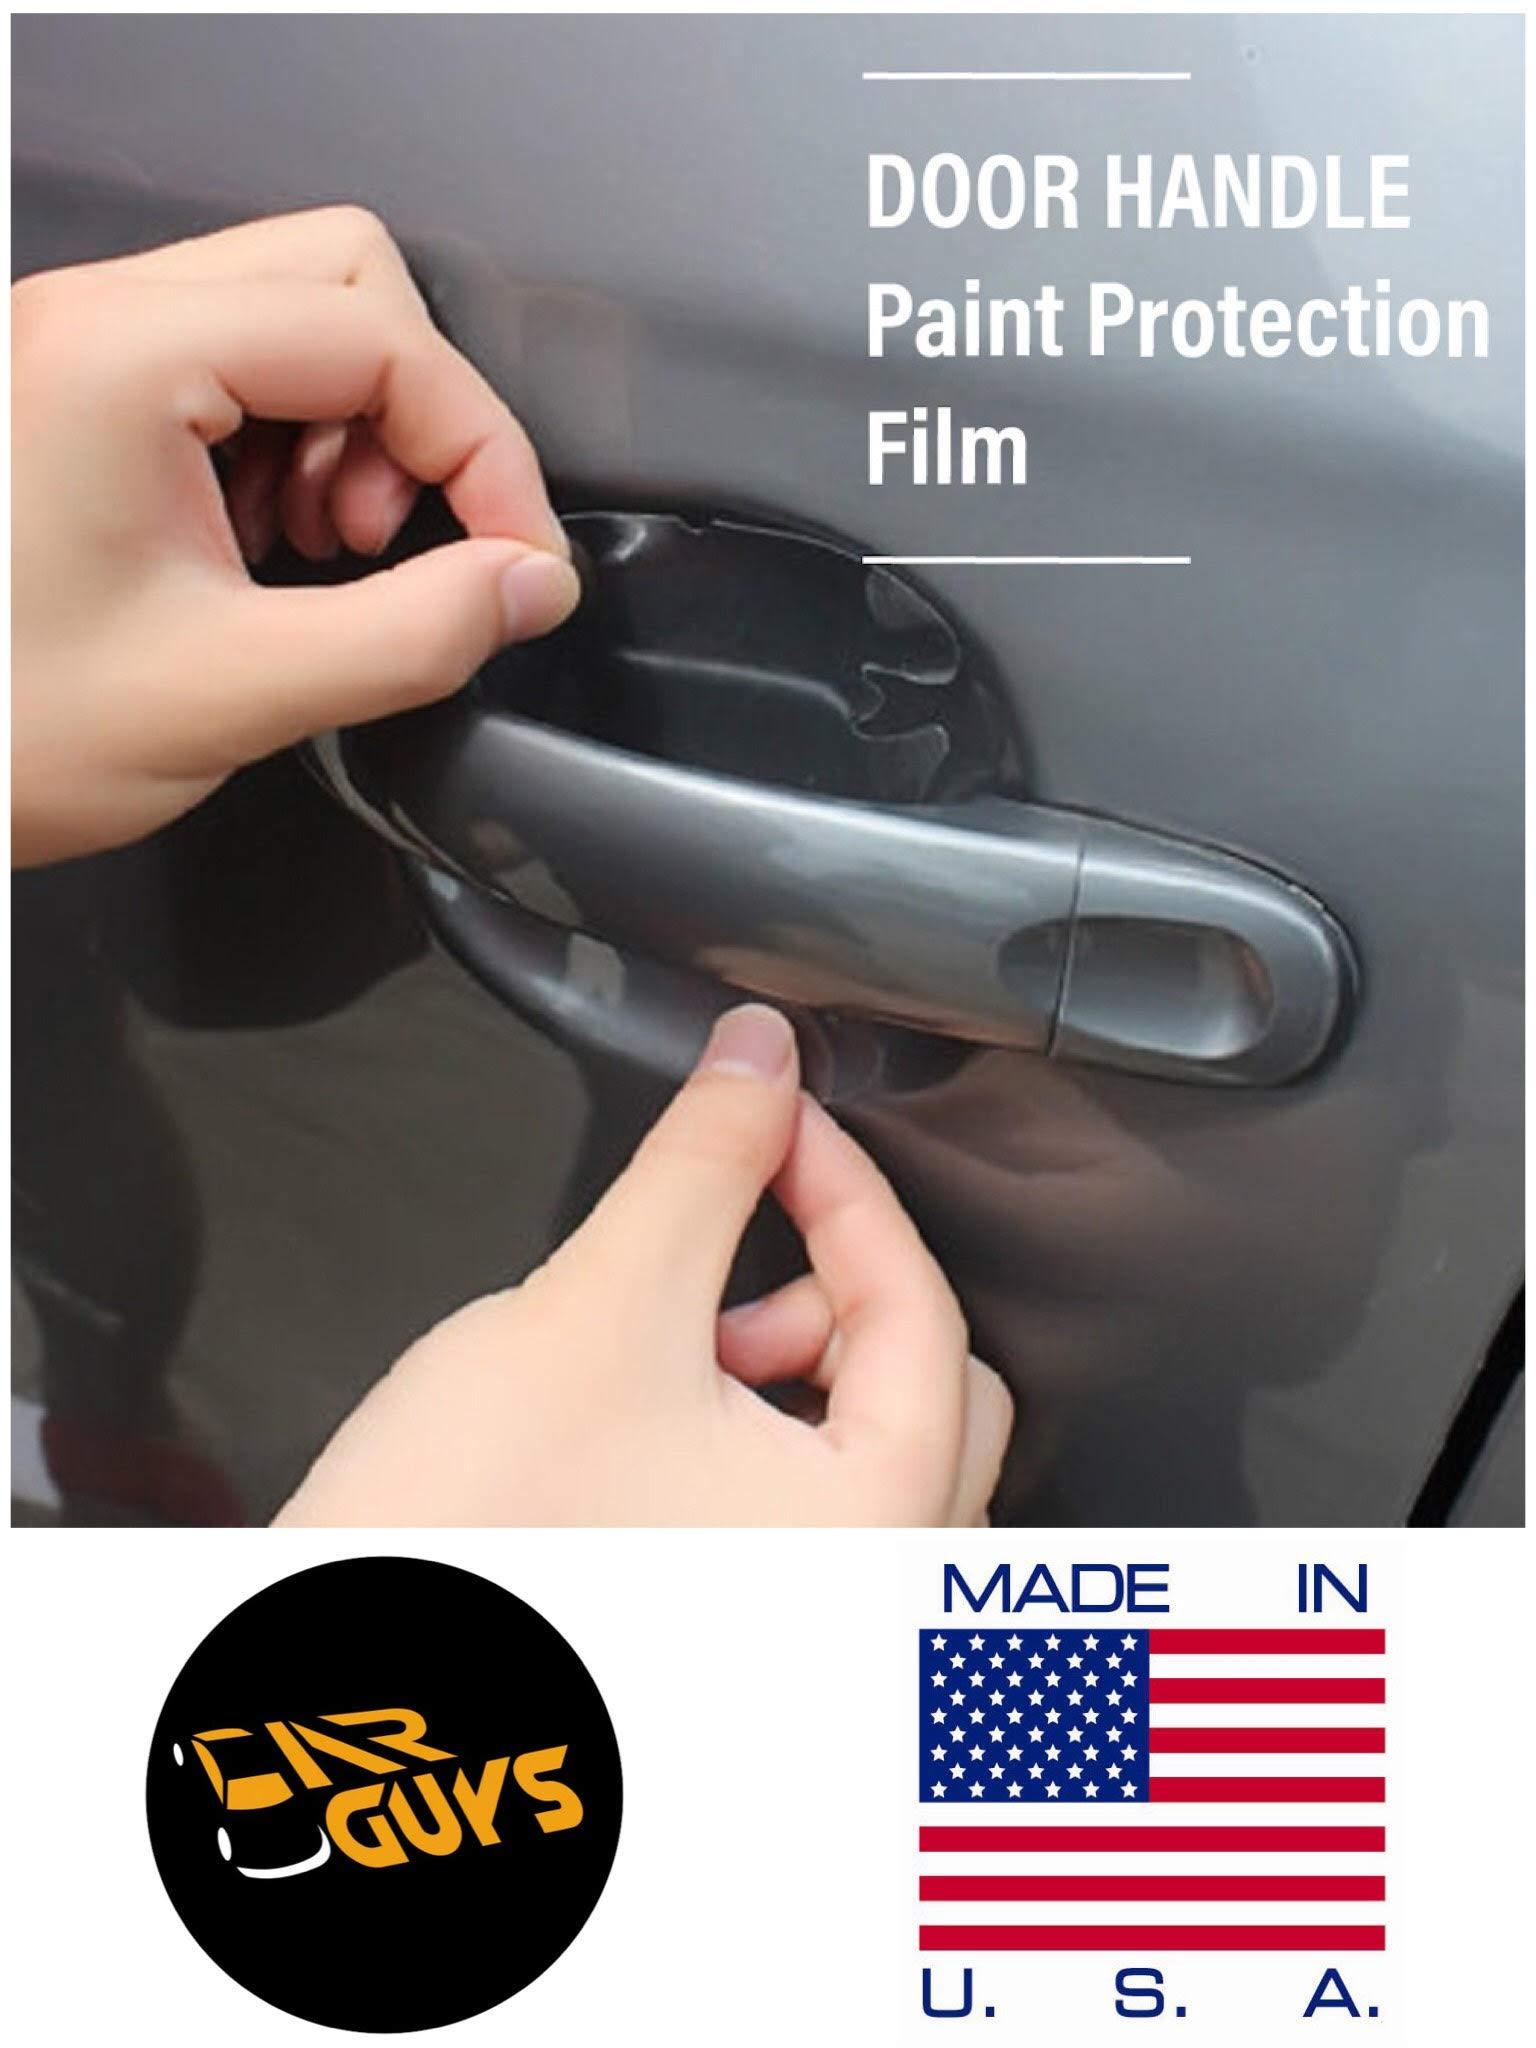 Car Guys- Door Handle Paint Protection Kit for All Cars- Saint Gobain PPF